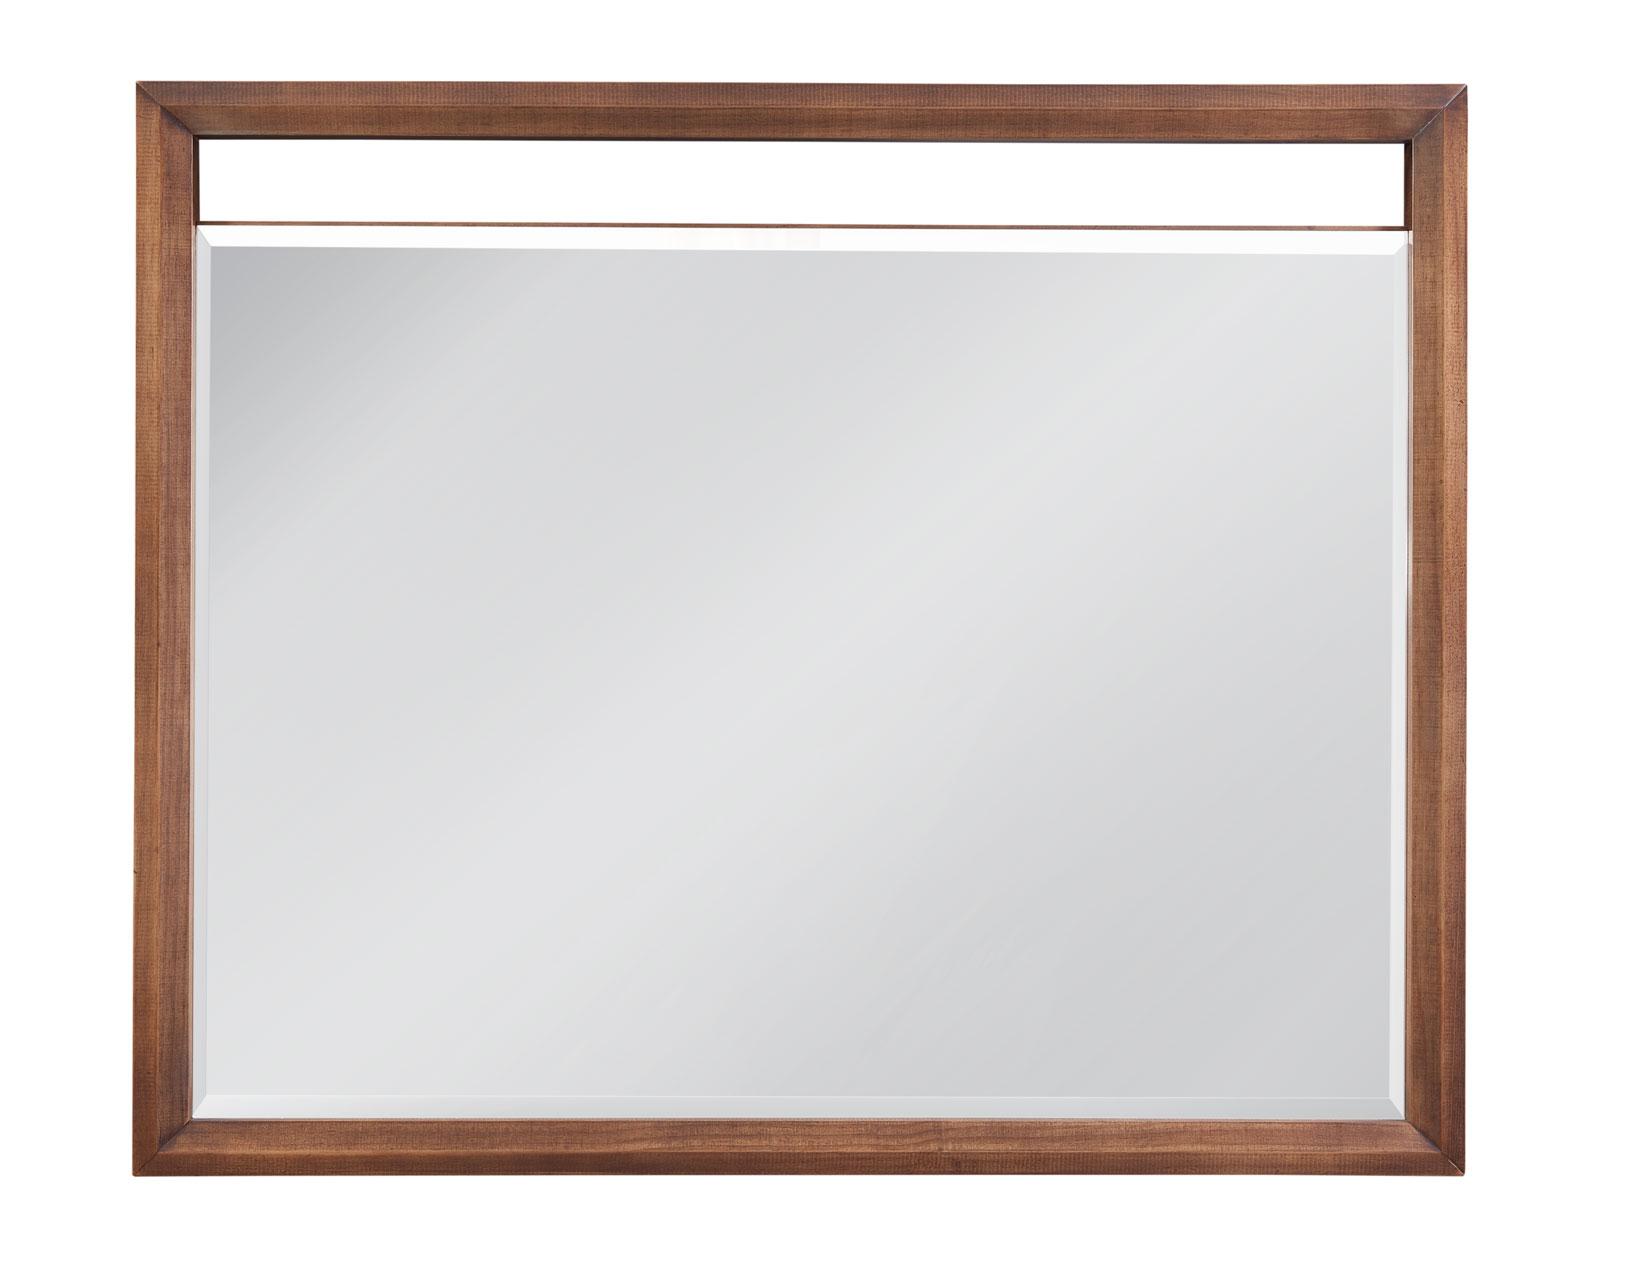 Lofton Dresser Mirror by Steve Silver at Northeast Factory Direct